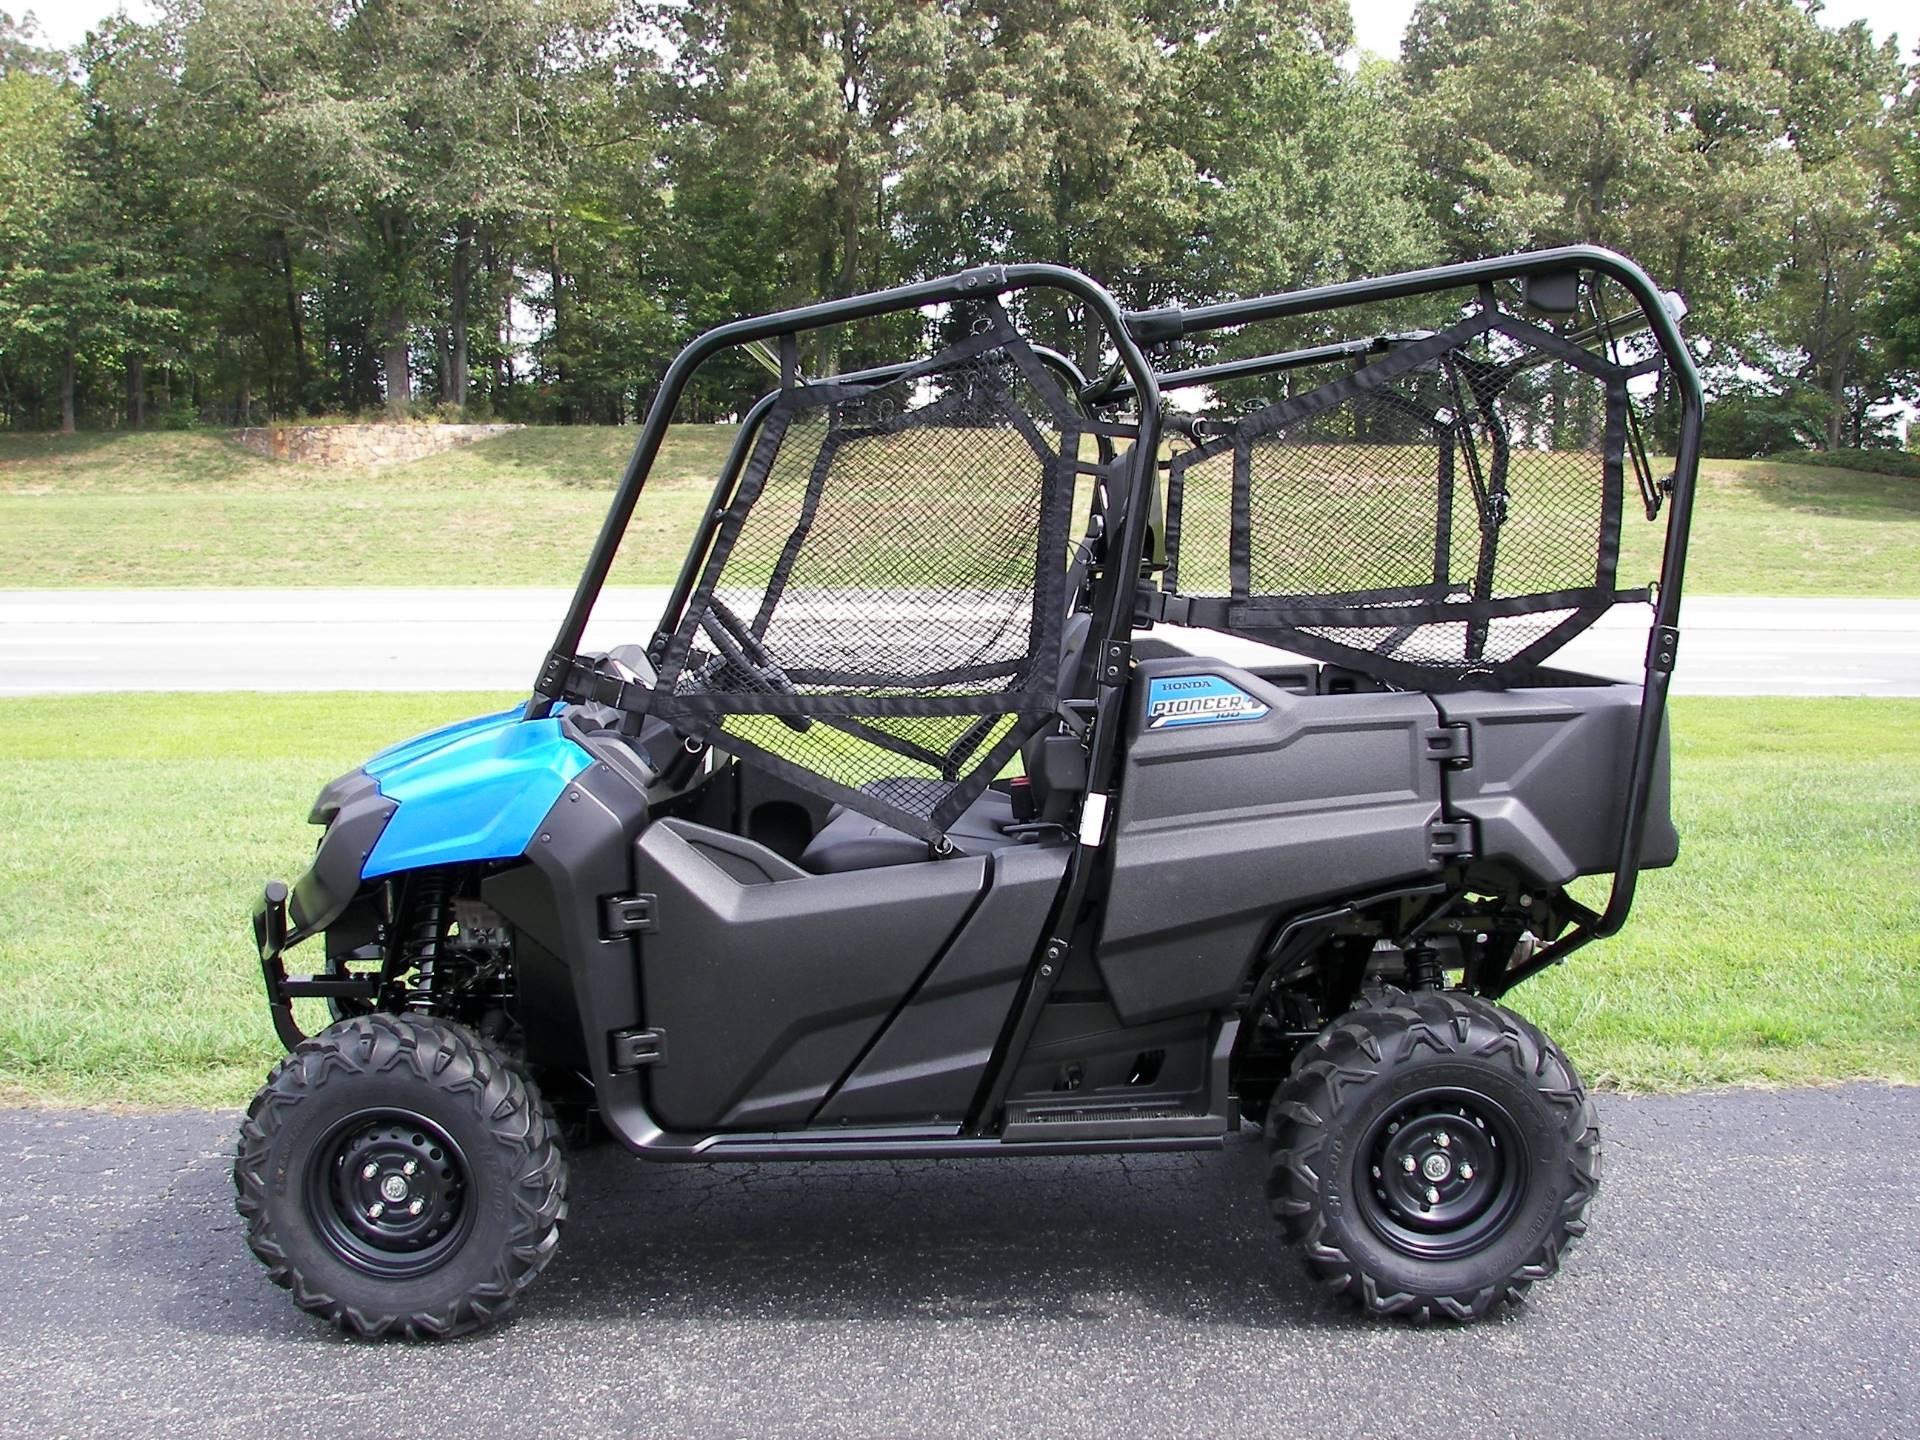 new 2016 honda pioneer 700 4 metallic blue sxs700m4 utility vehicles in lapeer mi. Black Bedroom Furniture Sets. Home Design Ideas